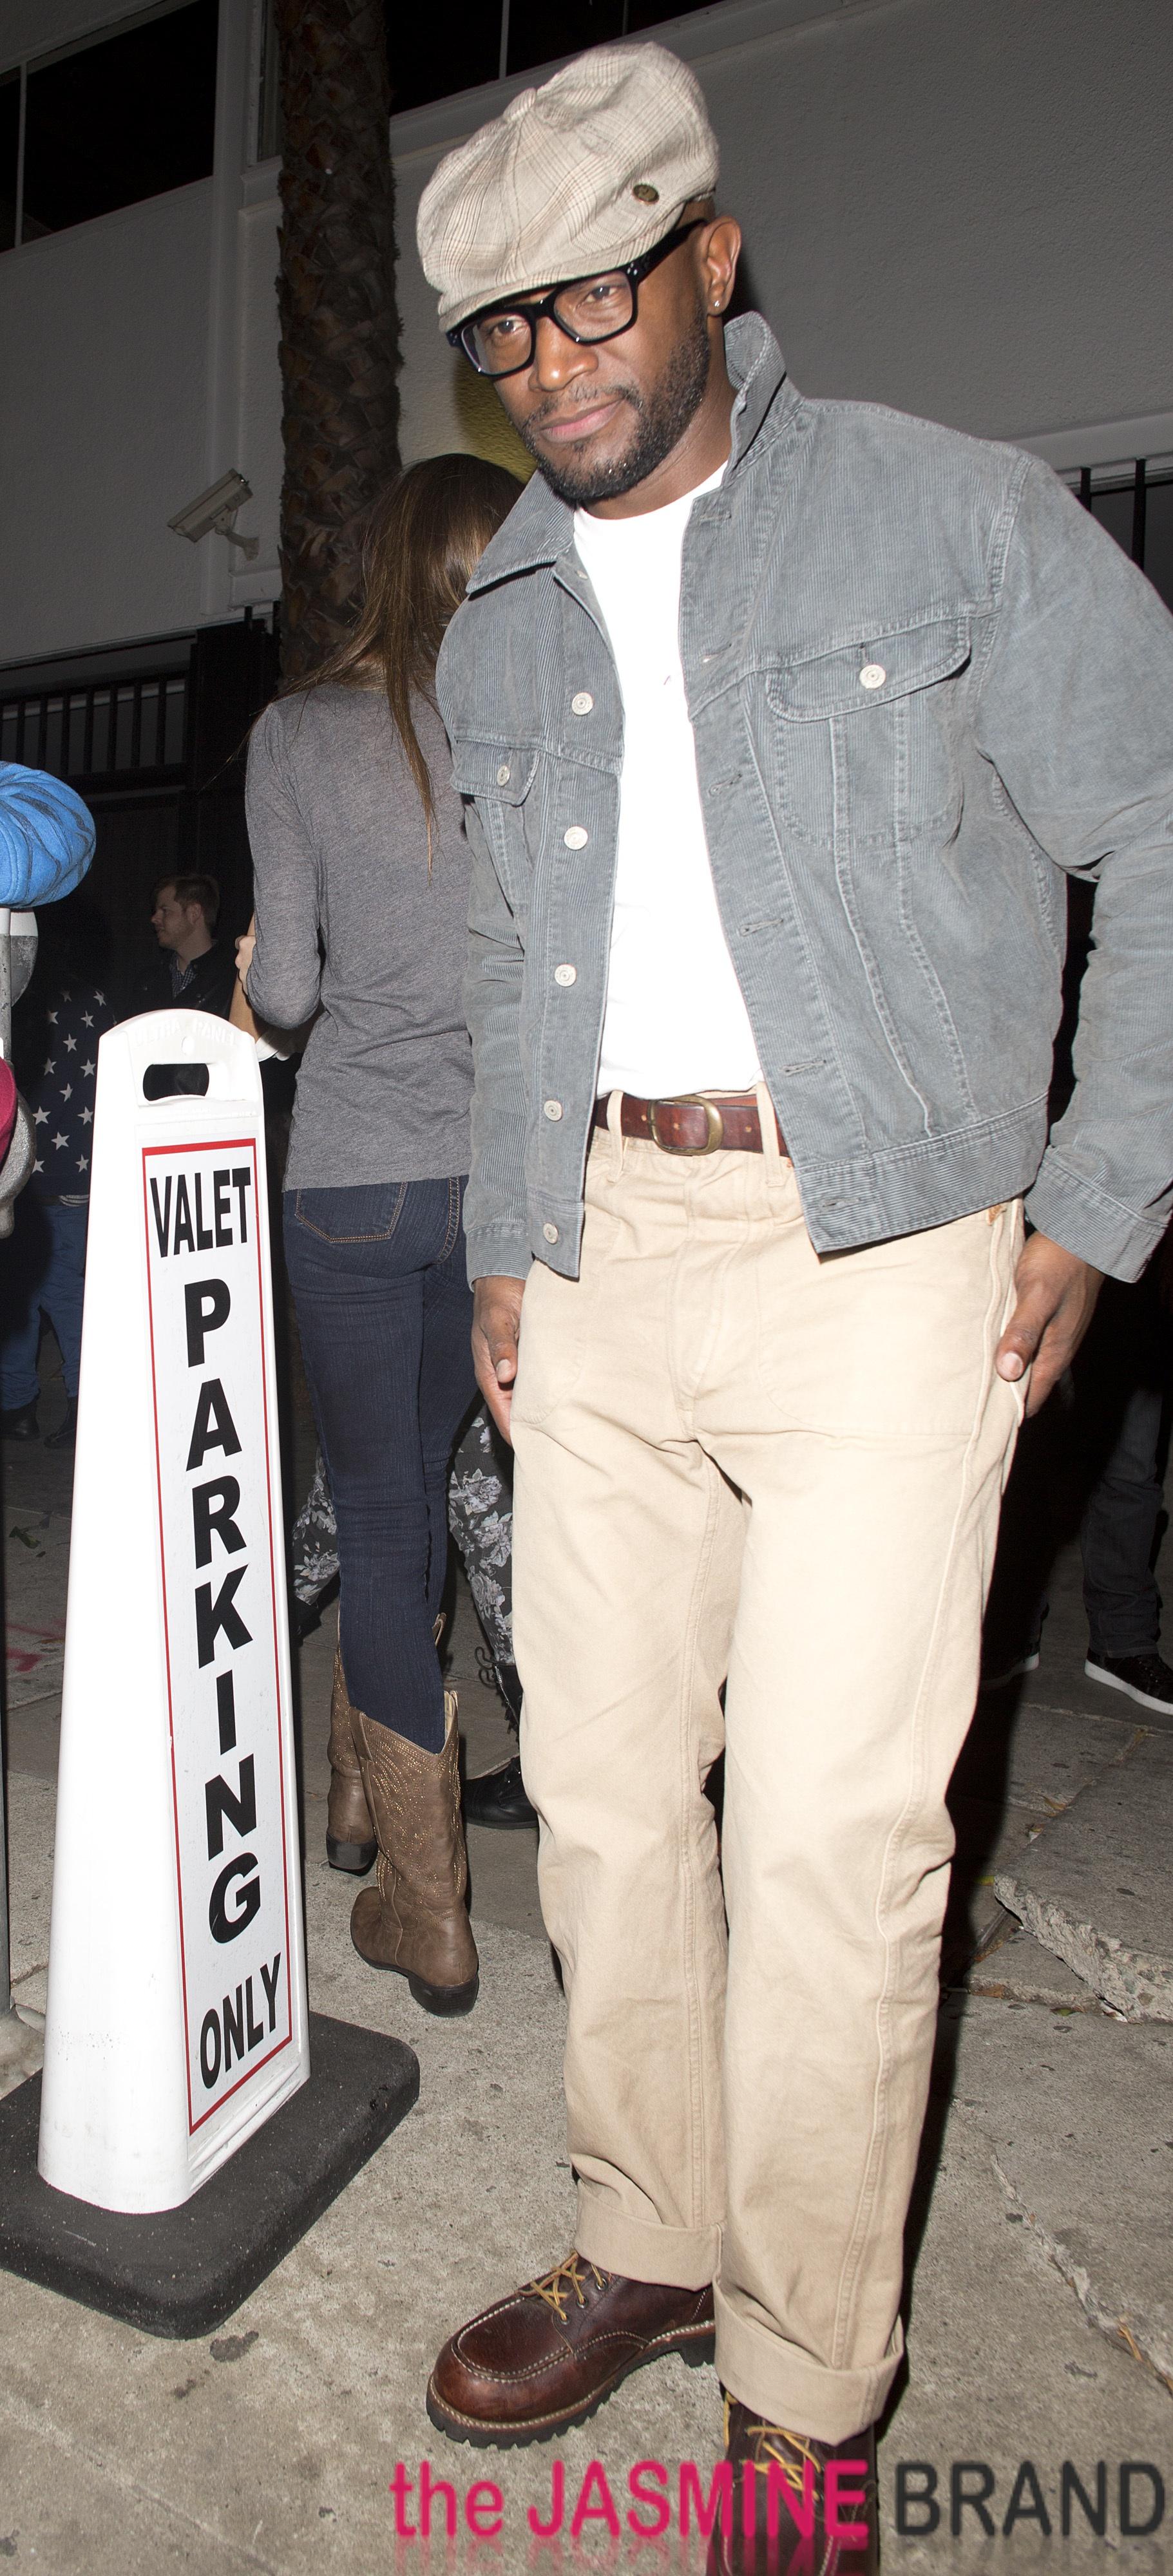 Taye Diggs leaves a Hollywood night club called AV